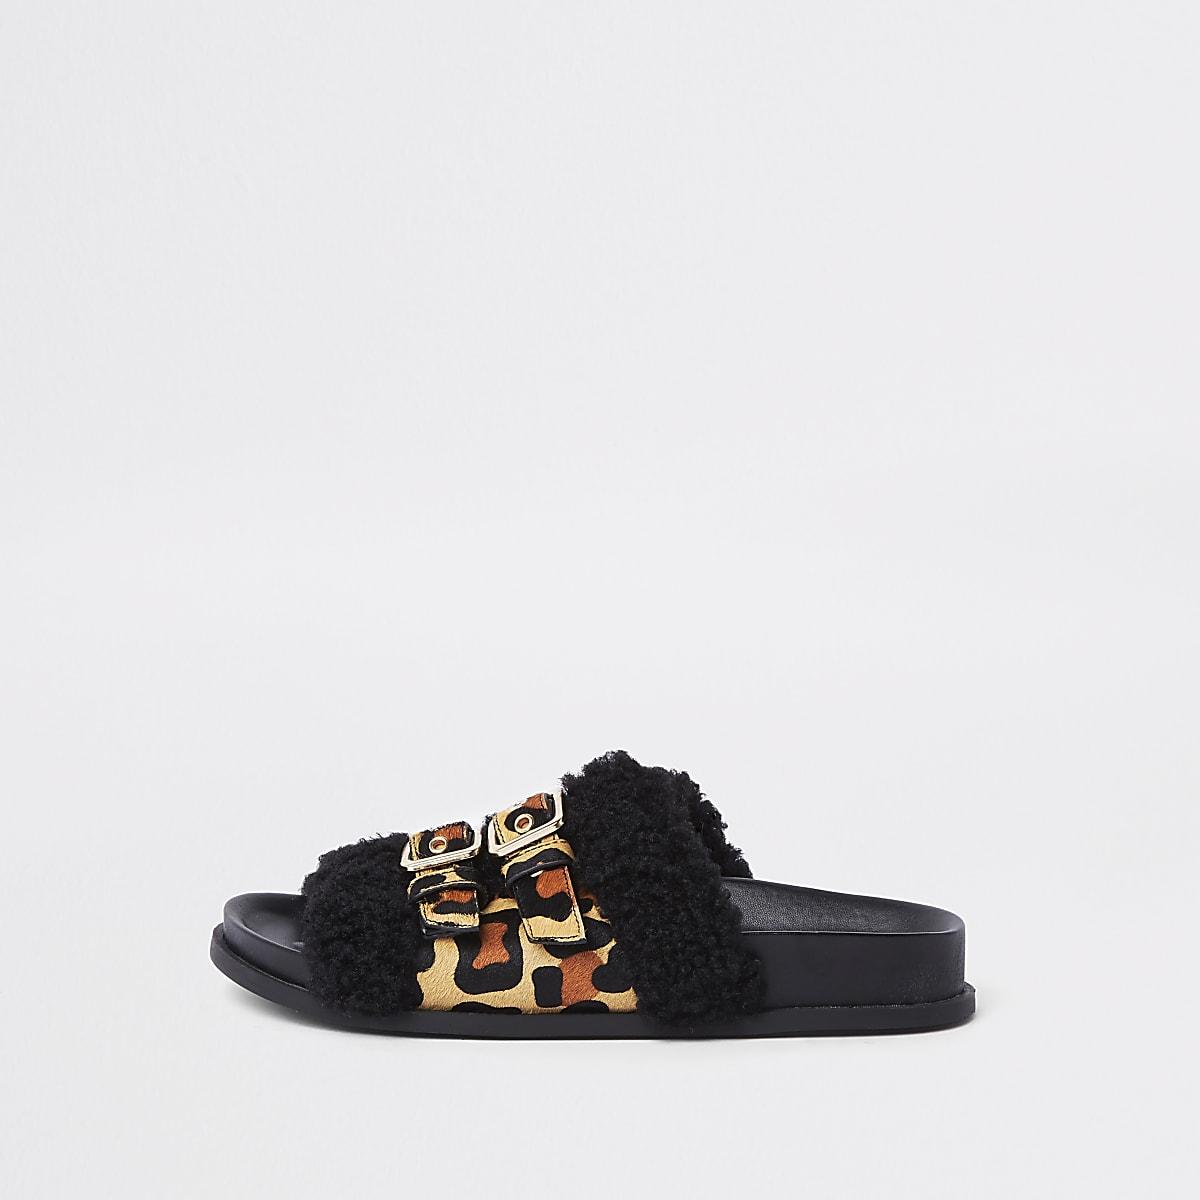 Bruine slippers met luipaardprint, gesp en brede pasvorm